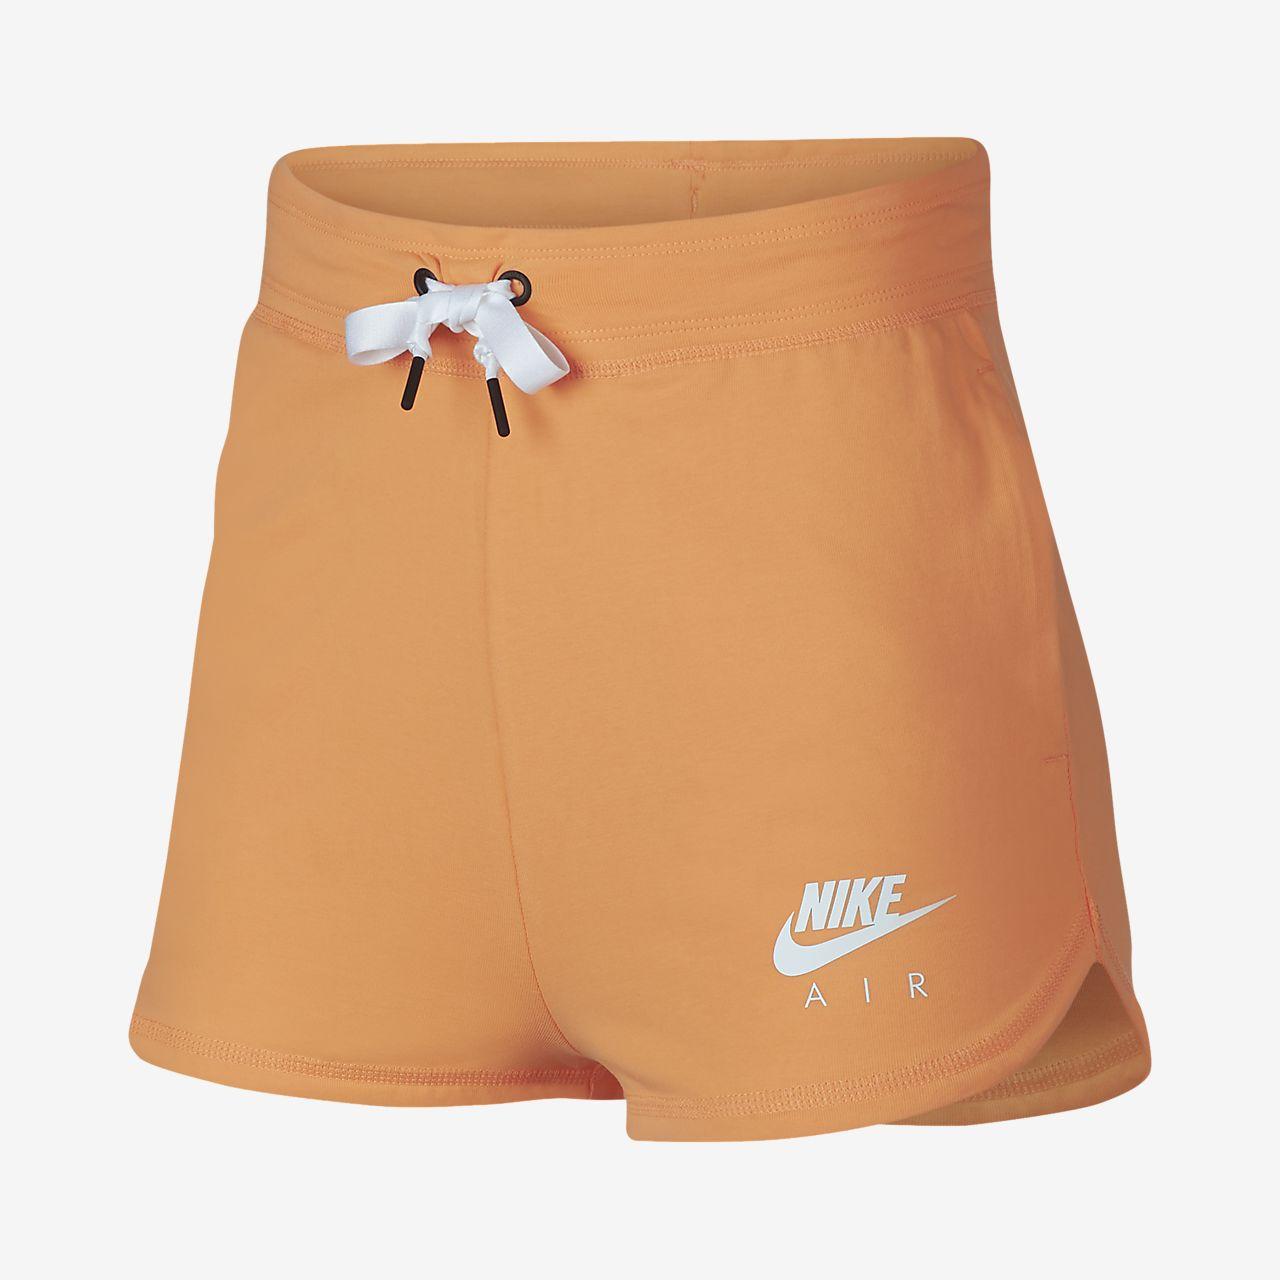 Short Nike Air pour Femme